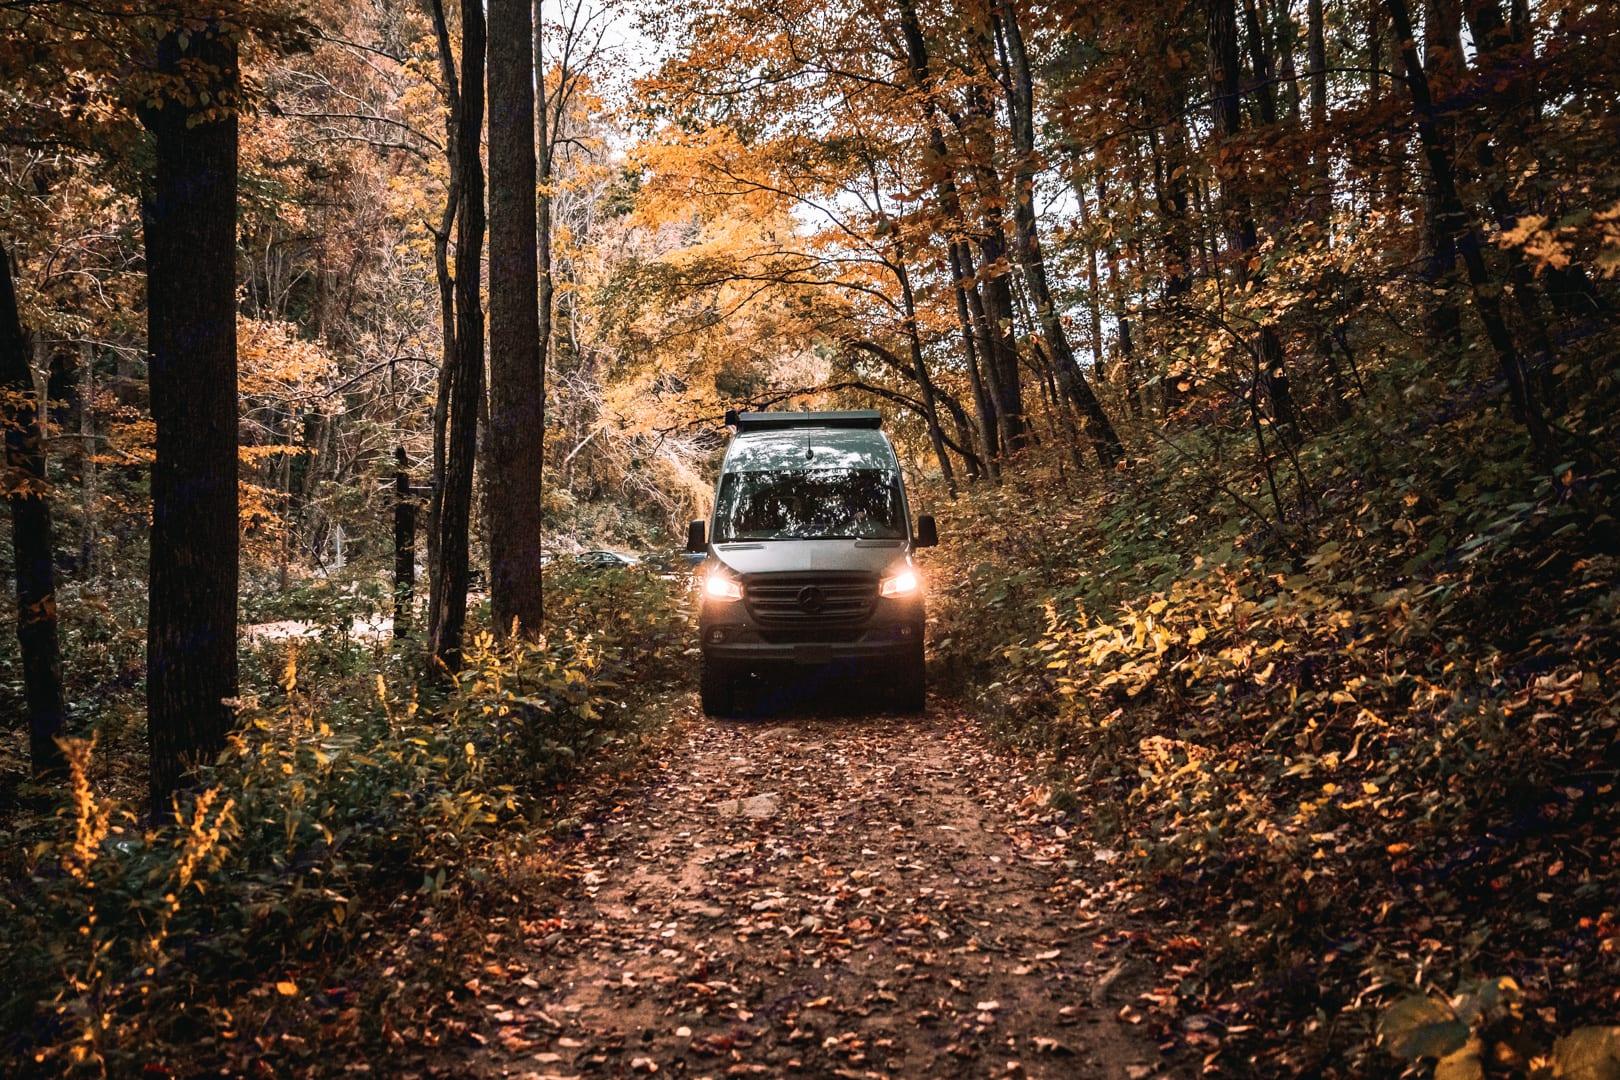 Mercedes-Benz Storyteller Overland Stealth MODE 4x4 2021